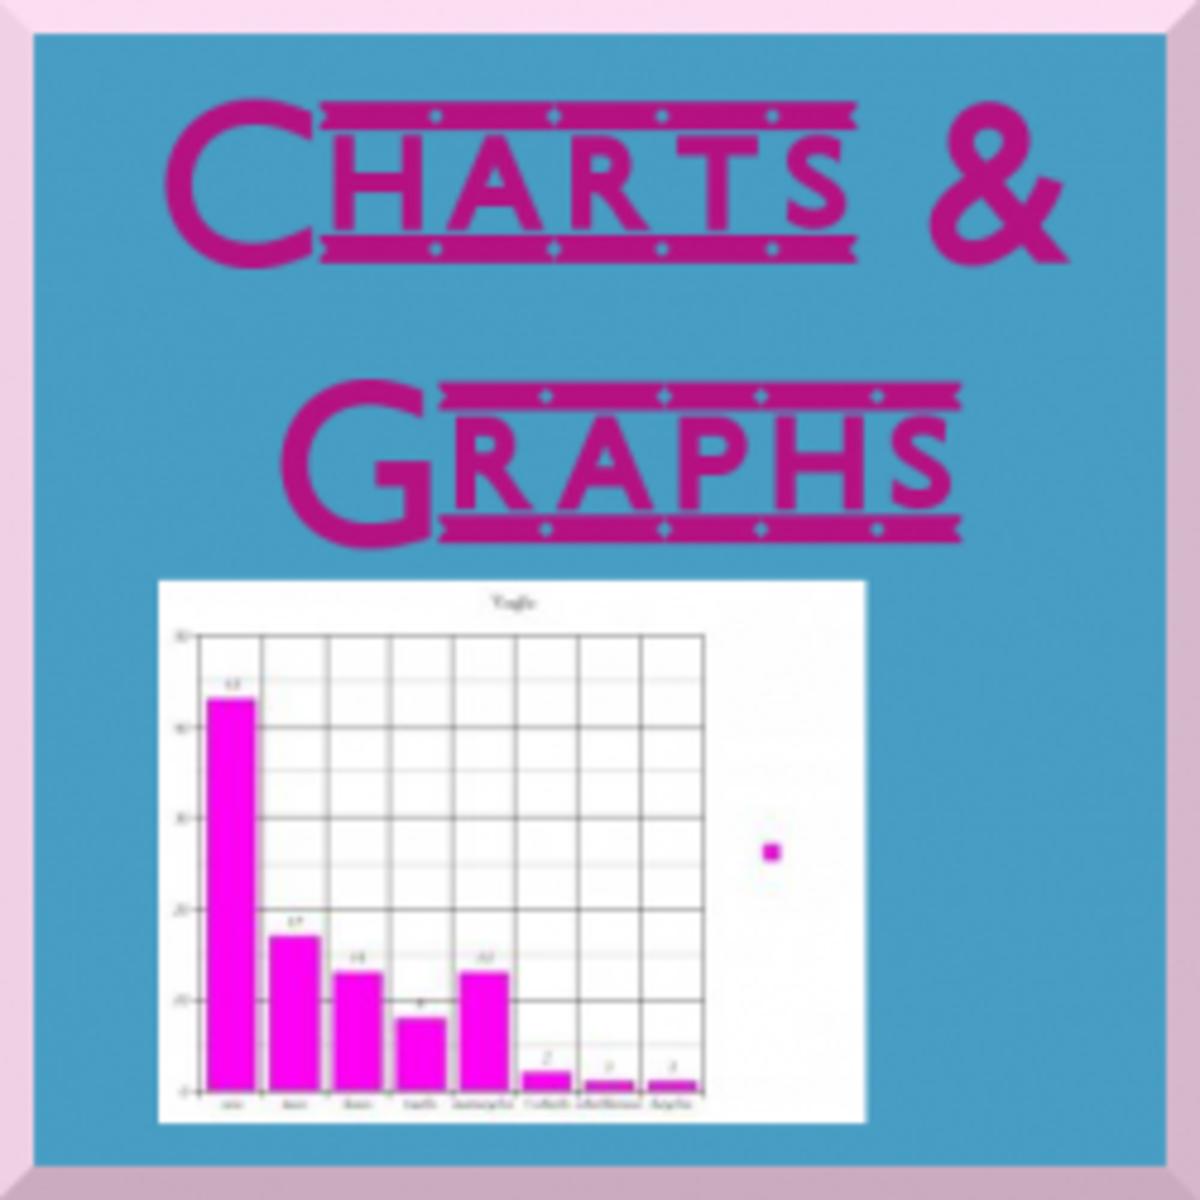 chartsandgraphs